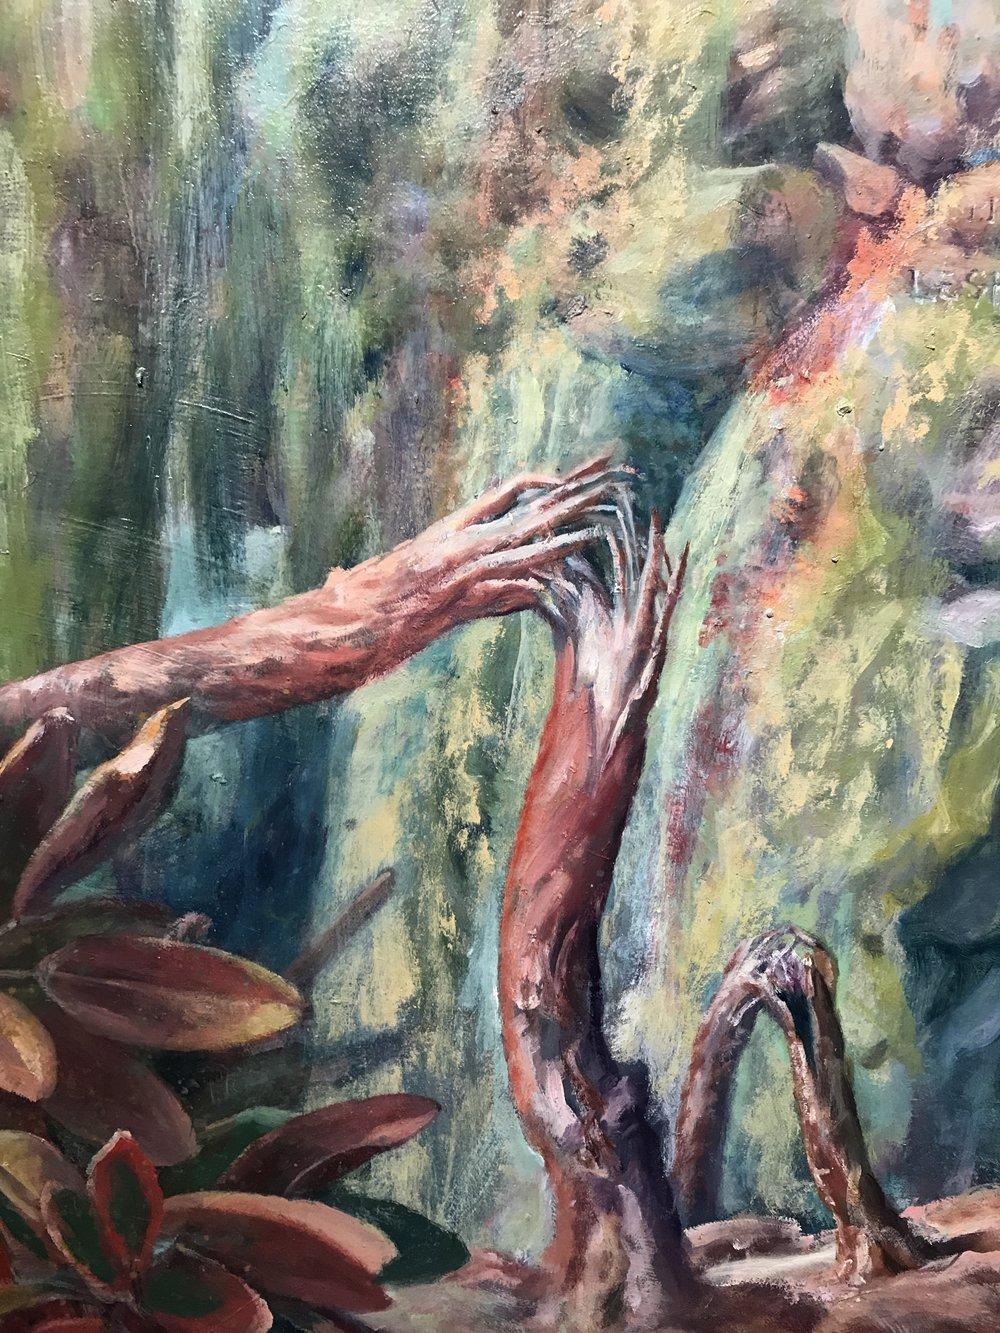 Julie Heffernan, Requiem for Palmyra  (detail),2016,oil on canvas,Courtesy of Catharine Clark Gallery